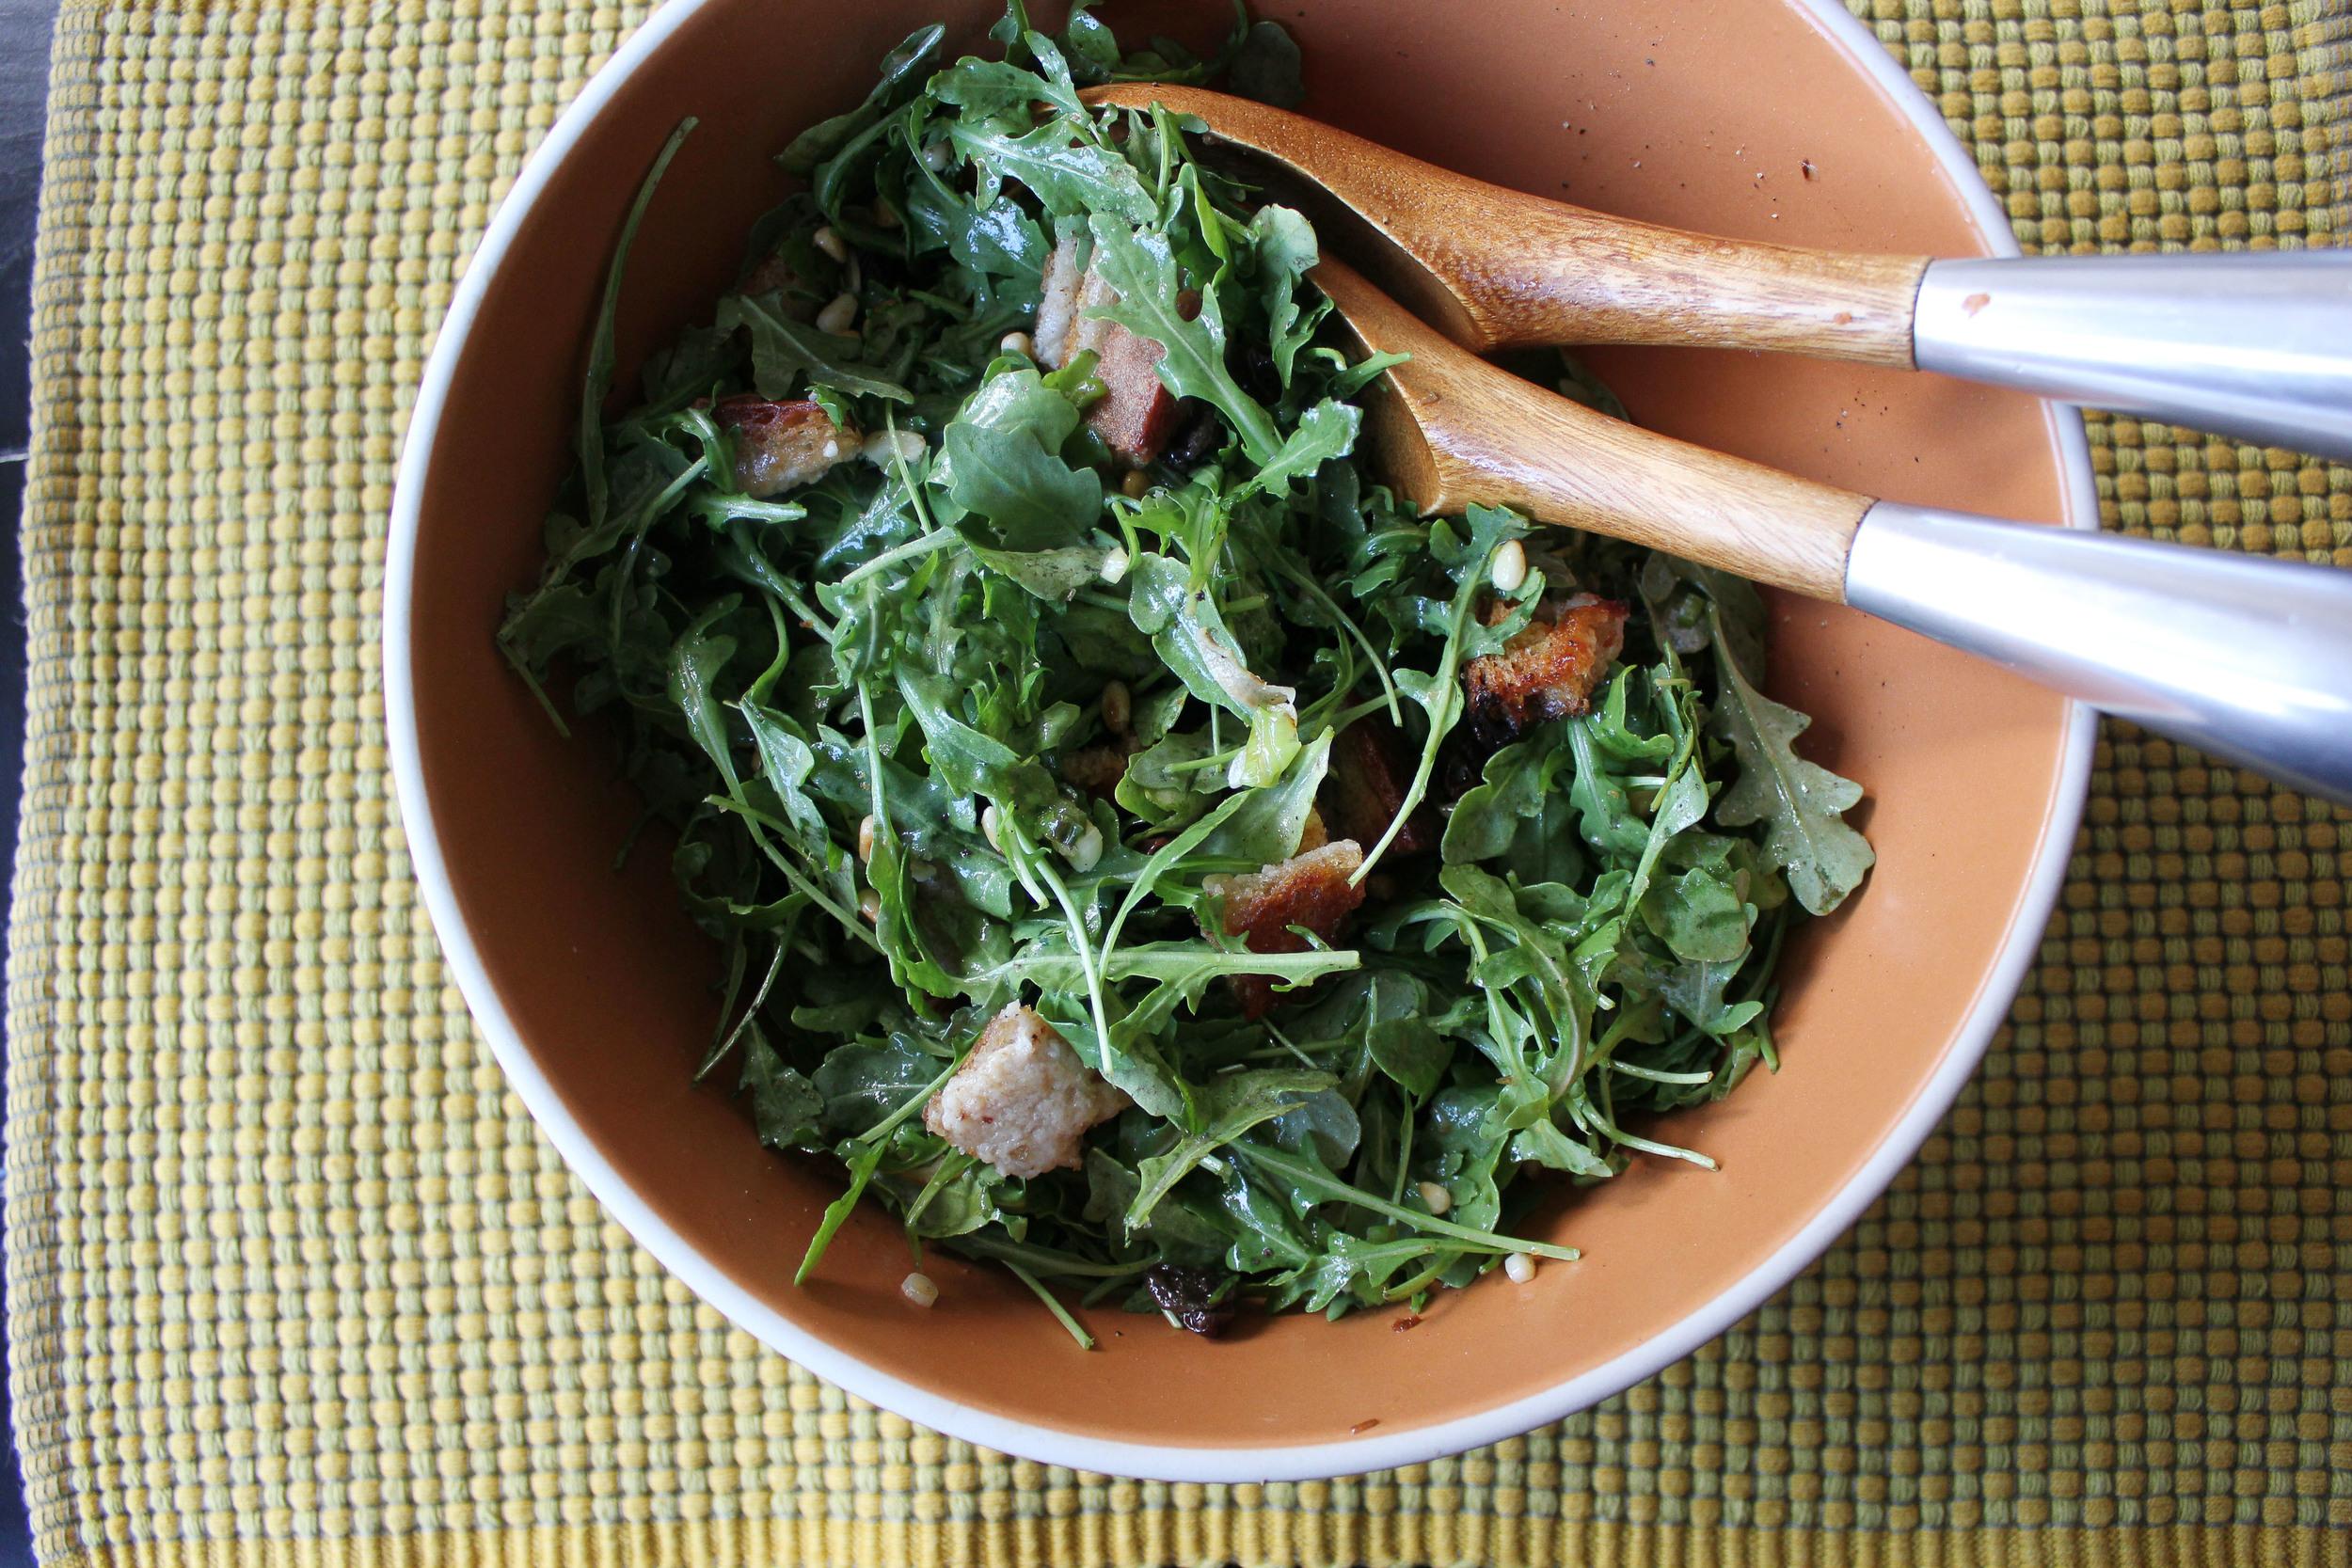 Zuni Cafe bread salad - Fancy Casual